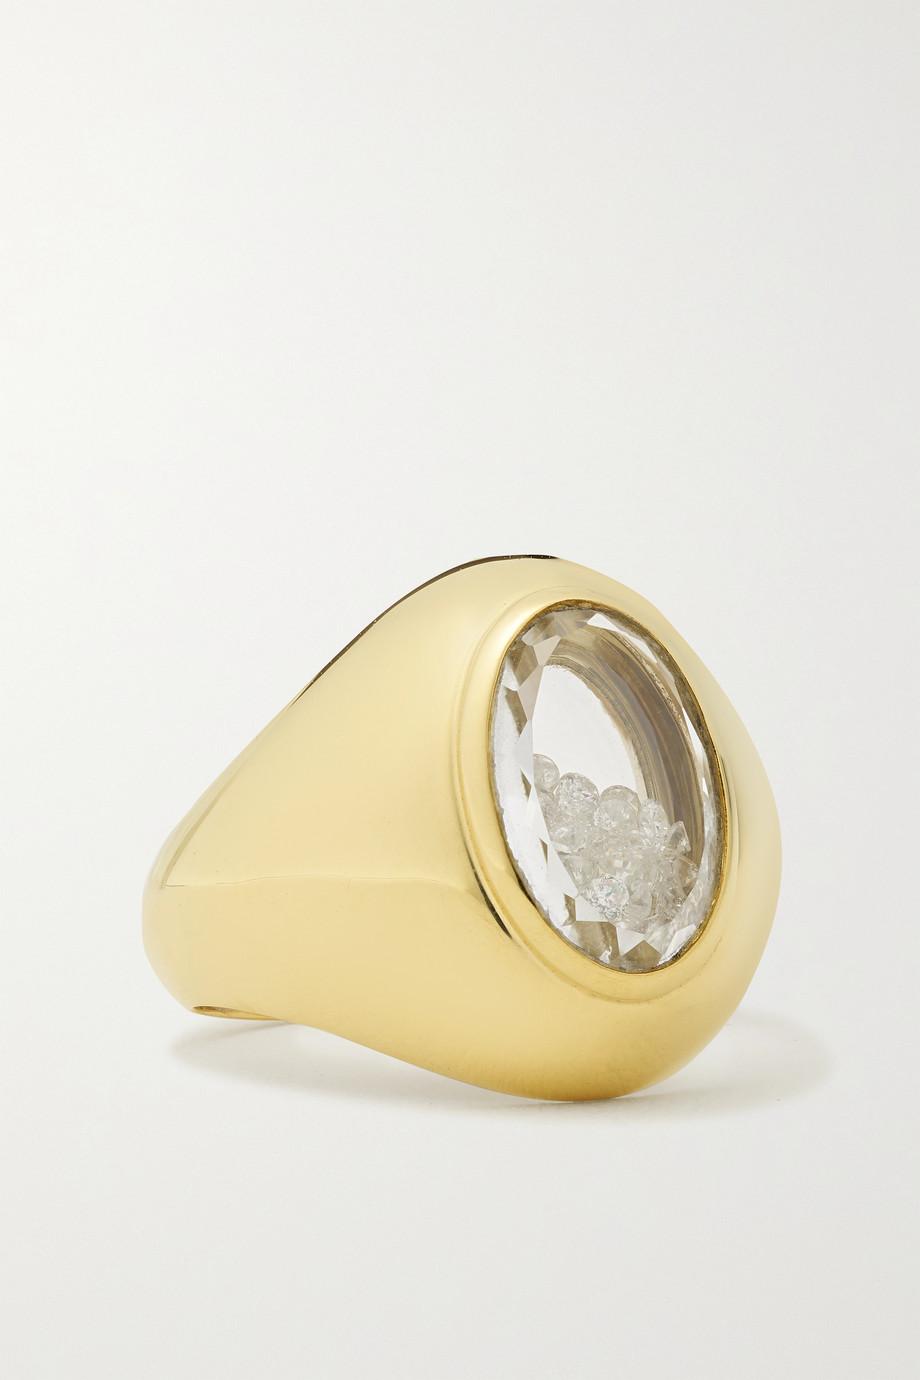 Moritz Glik Dedinho 18-karat gold, sapphire crystal and diamond signet ring